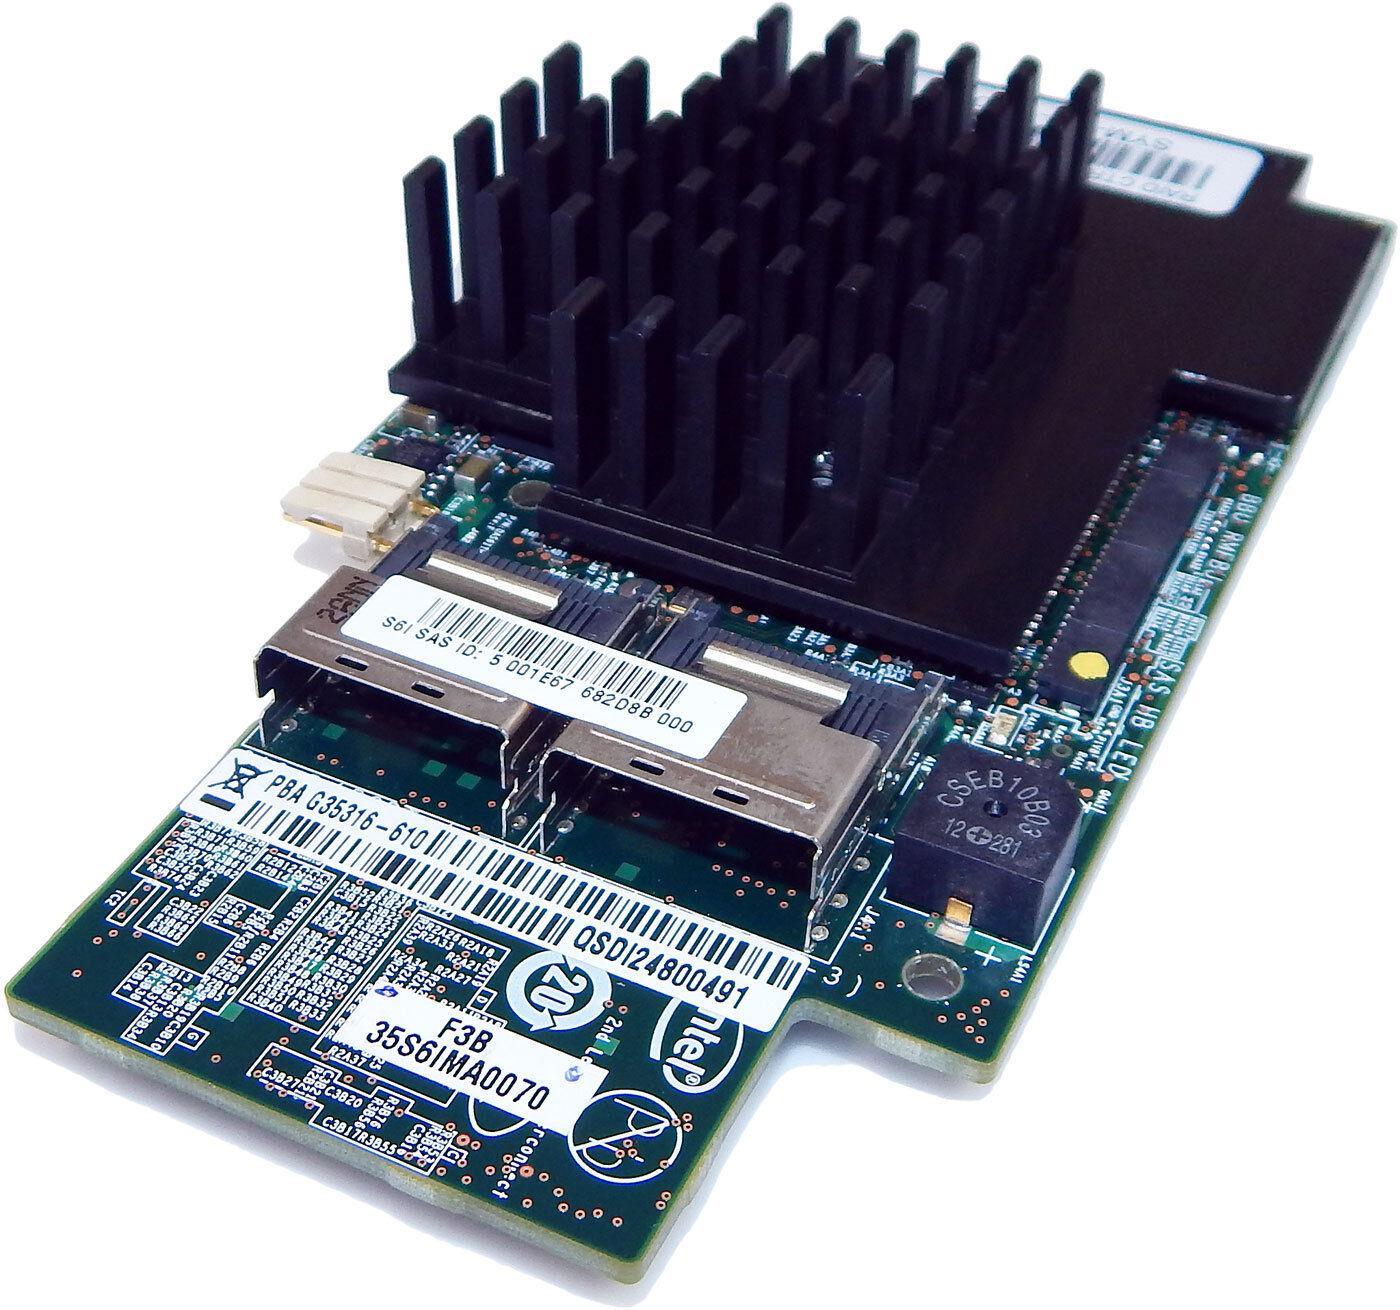 INTEL X8 6Gb/S Integrato Raid Modulo RMS25CB08 370-1020-02 G35316-610